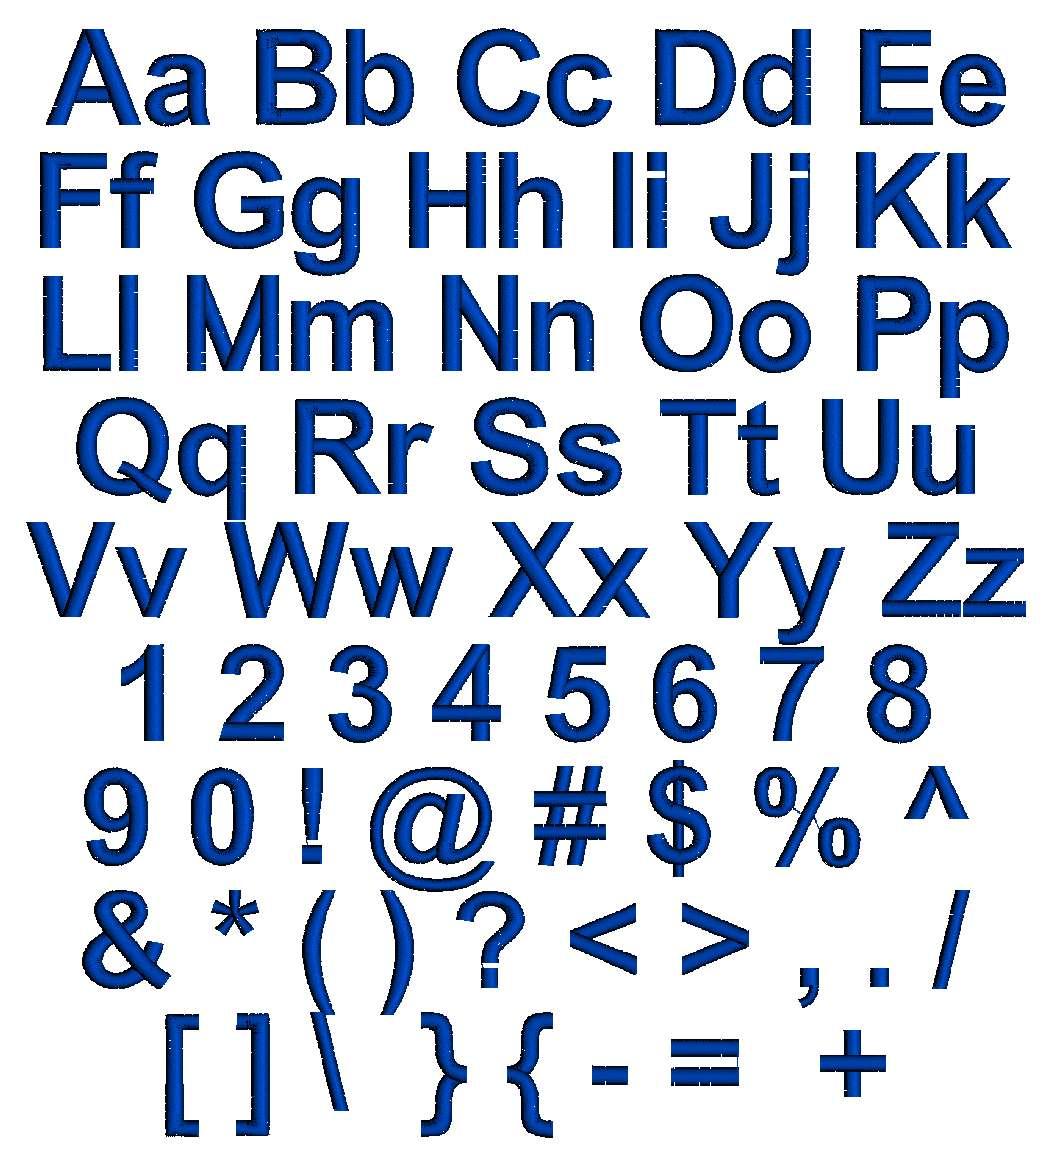 SAME Monogram  Font Ch...